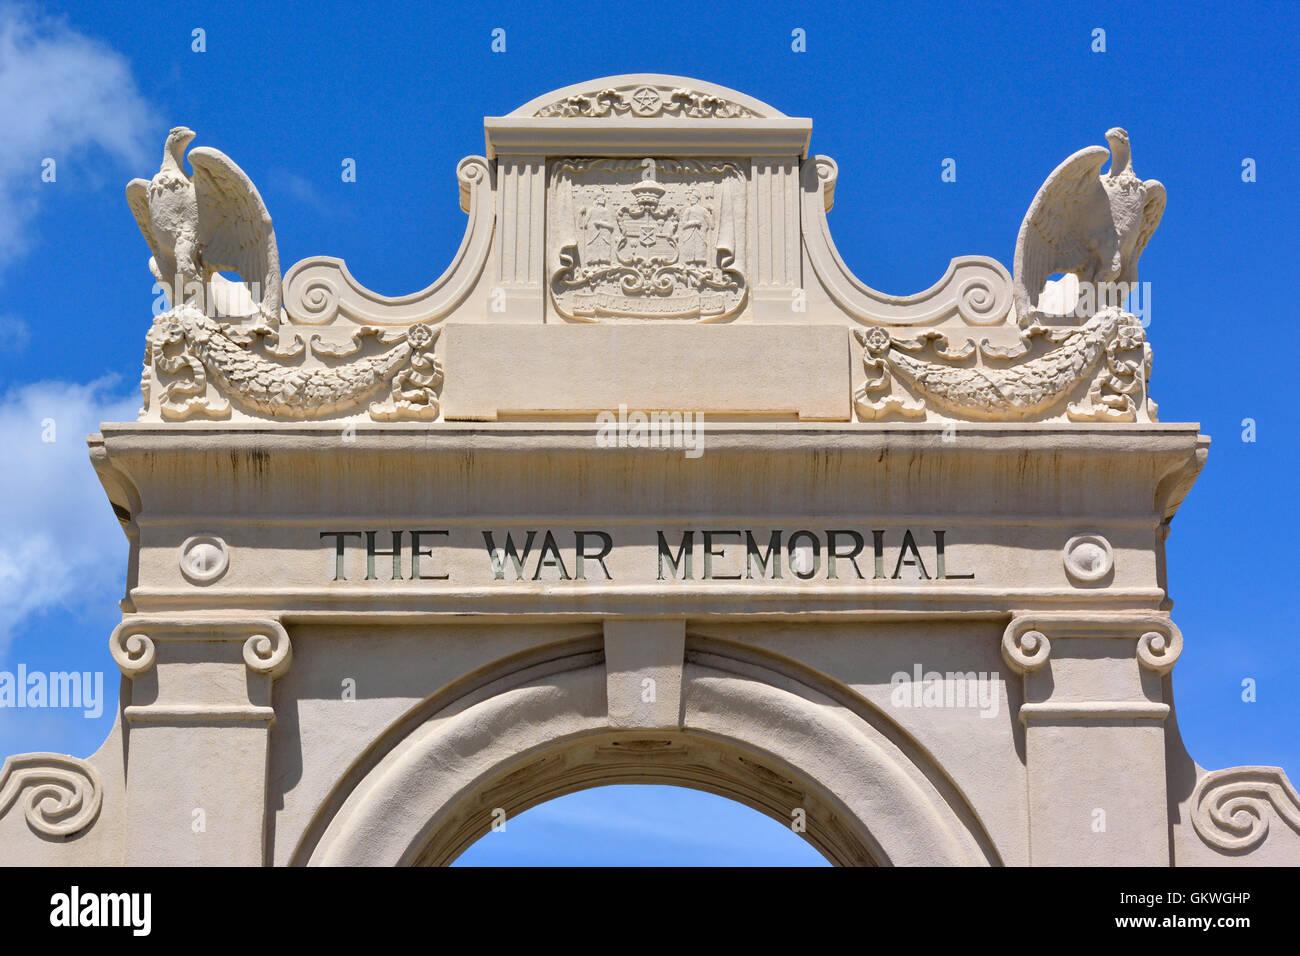 Waikiki Natatorium War Memorial in Honolulu, Hawaii - Stock Image